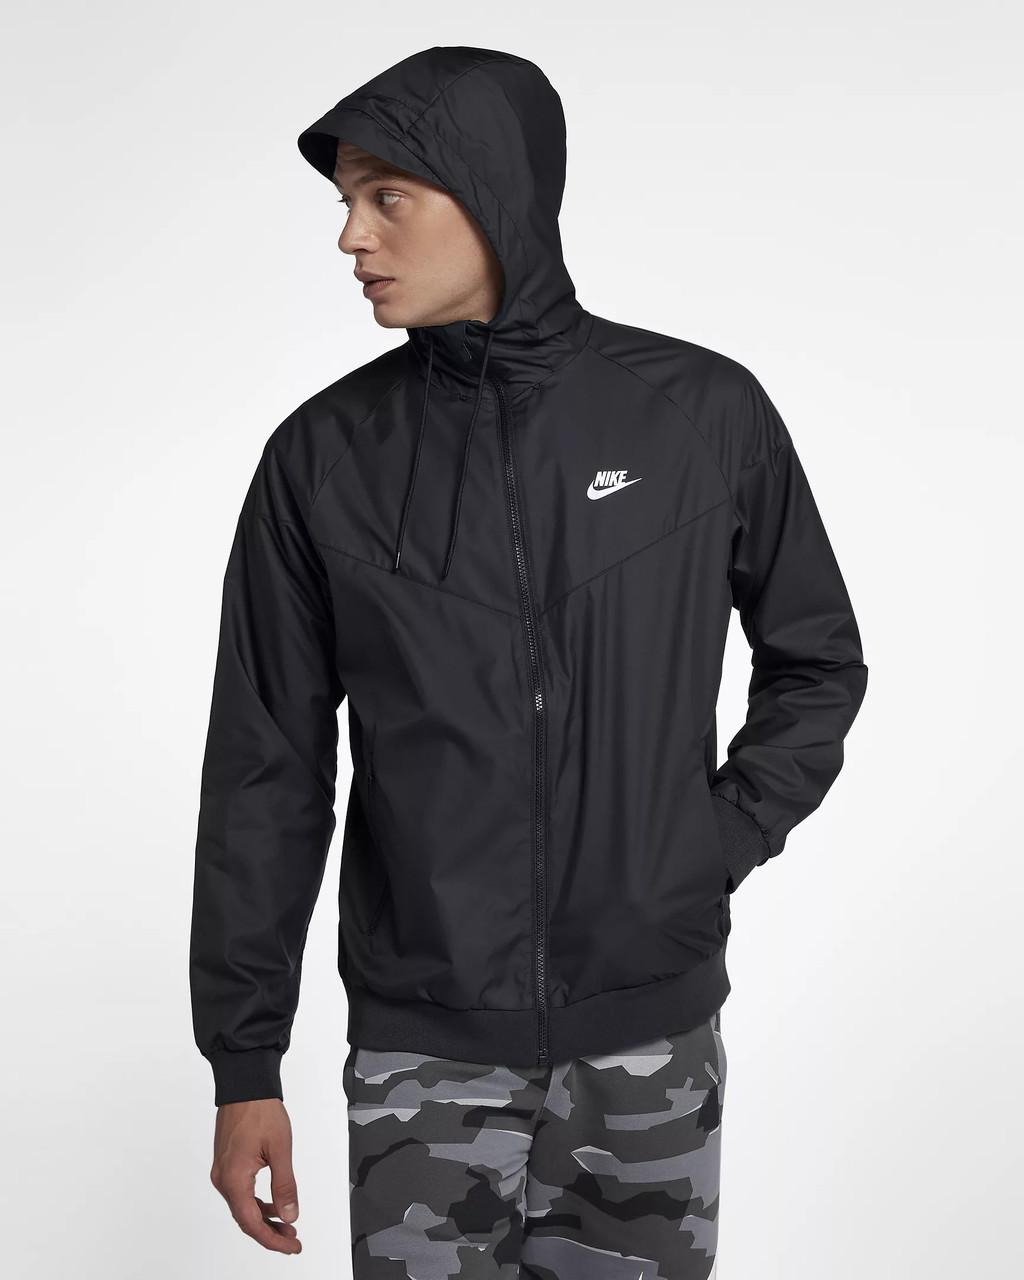 30ff312d Куртка Nike Sportswear Windrunner Jacket 727324-010 (Оригинал), цена 2 049  грн., купить в Киеве — Prom.ua (ID#762888955)